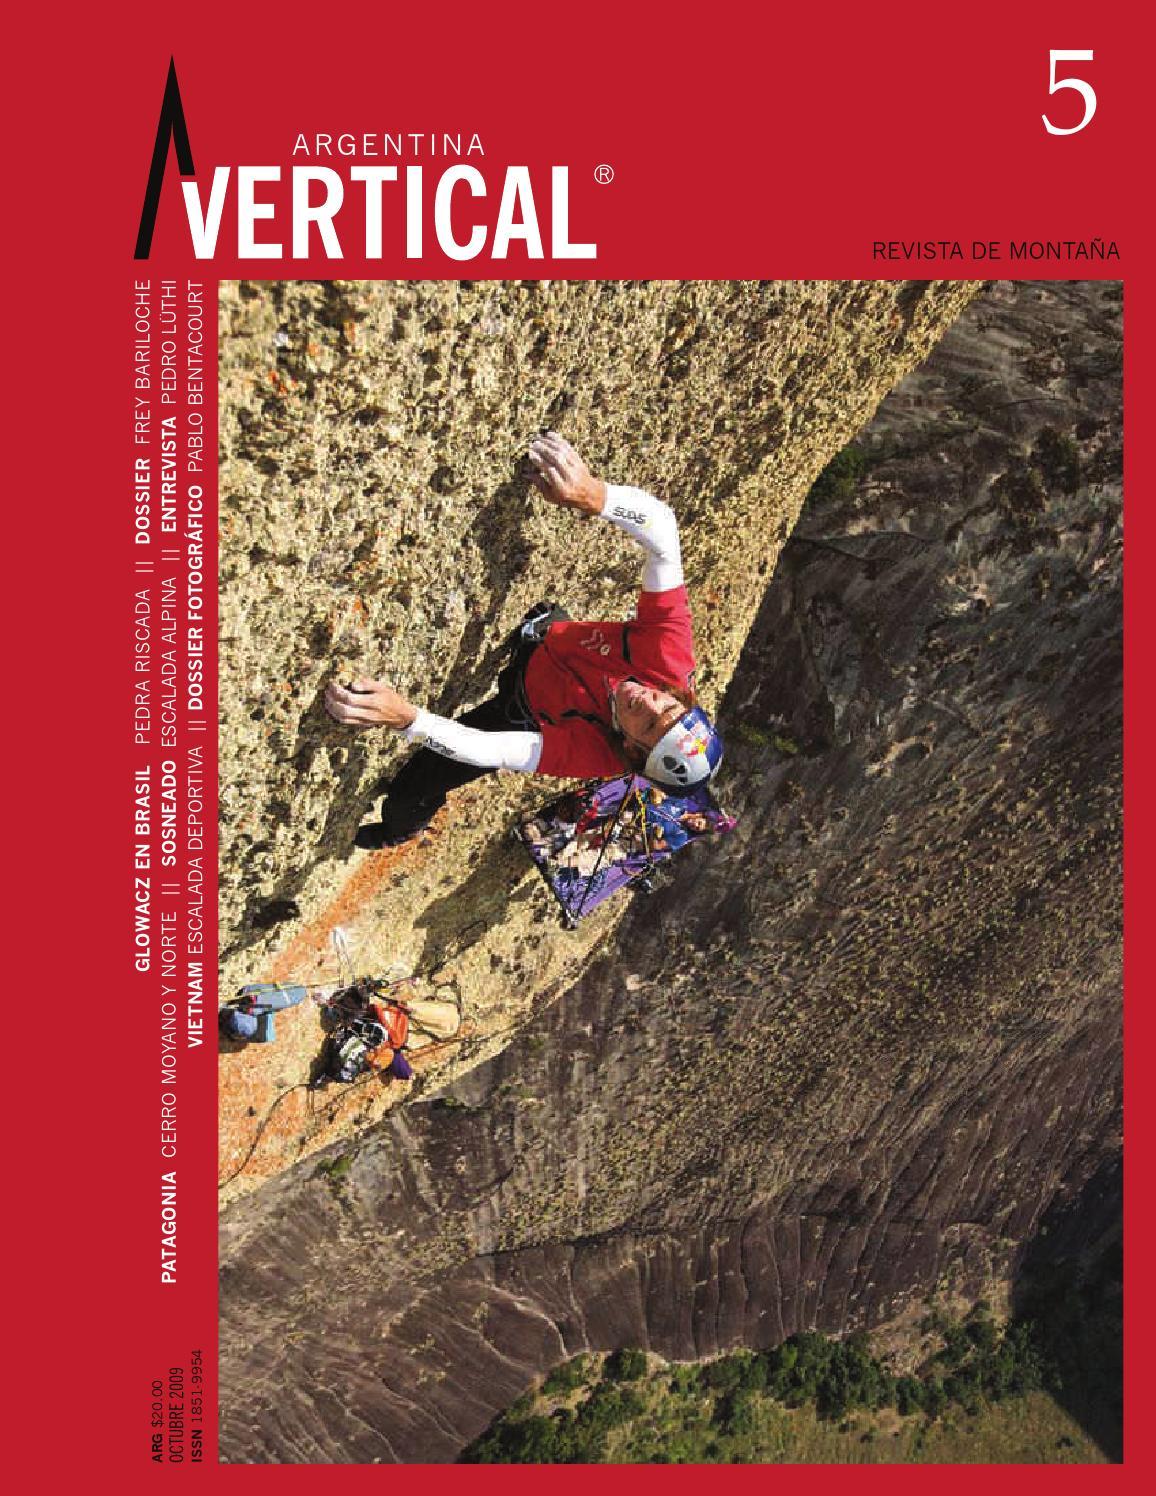 Vertical #5 Completo Digital by Vertical Argentina - Revista de ...